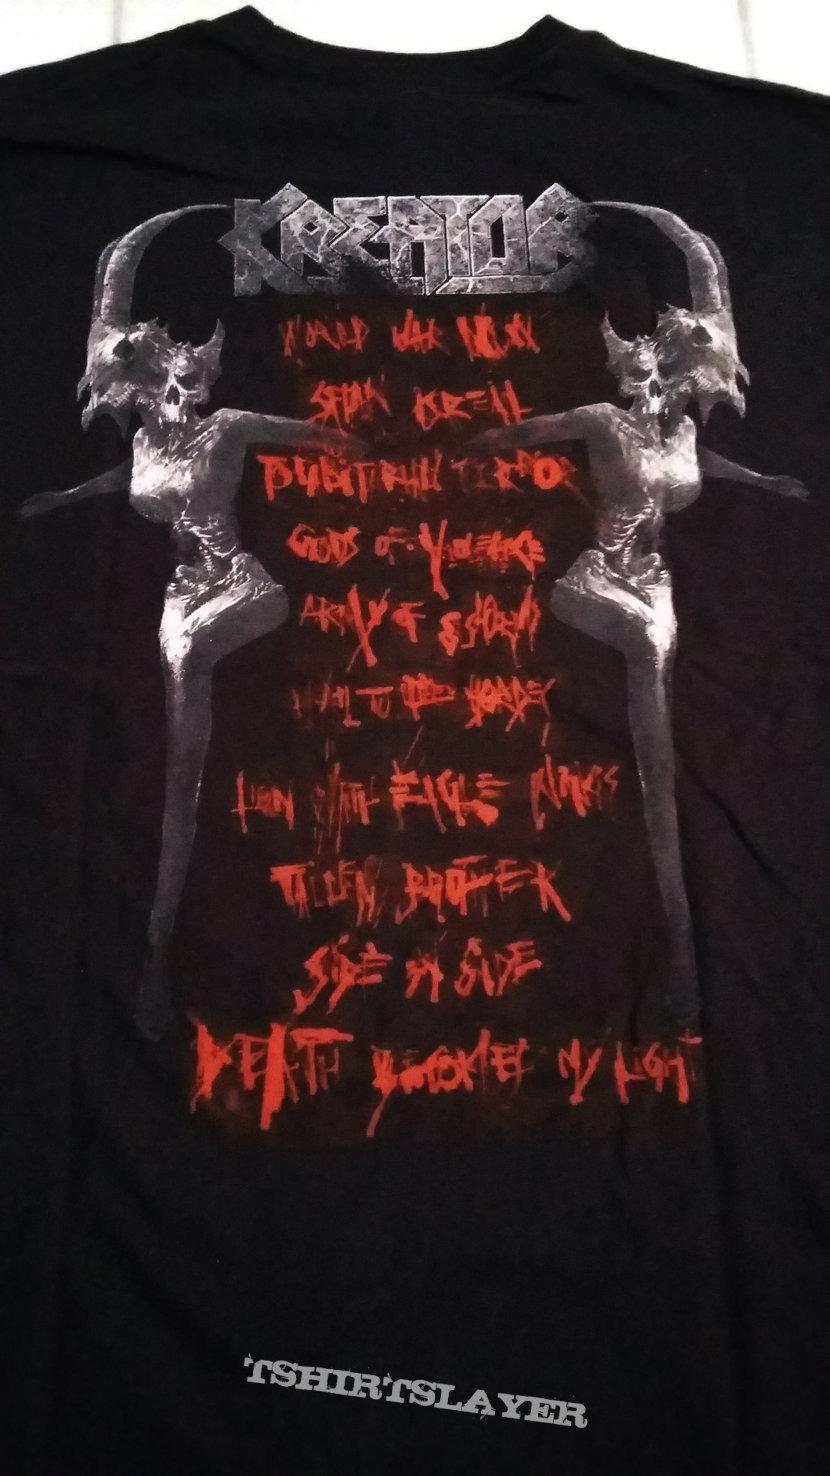 29. Kreator - Gods Of Violence T-shirt